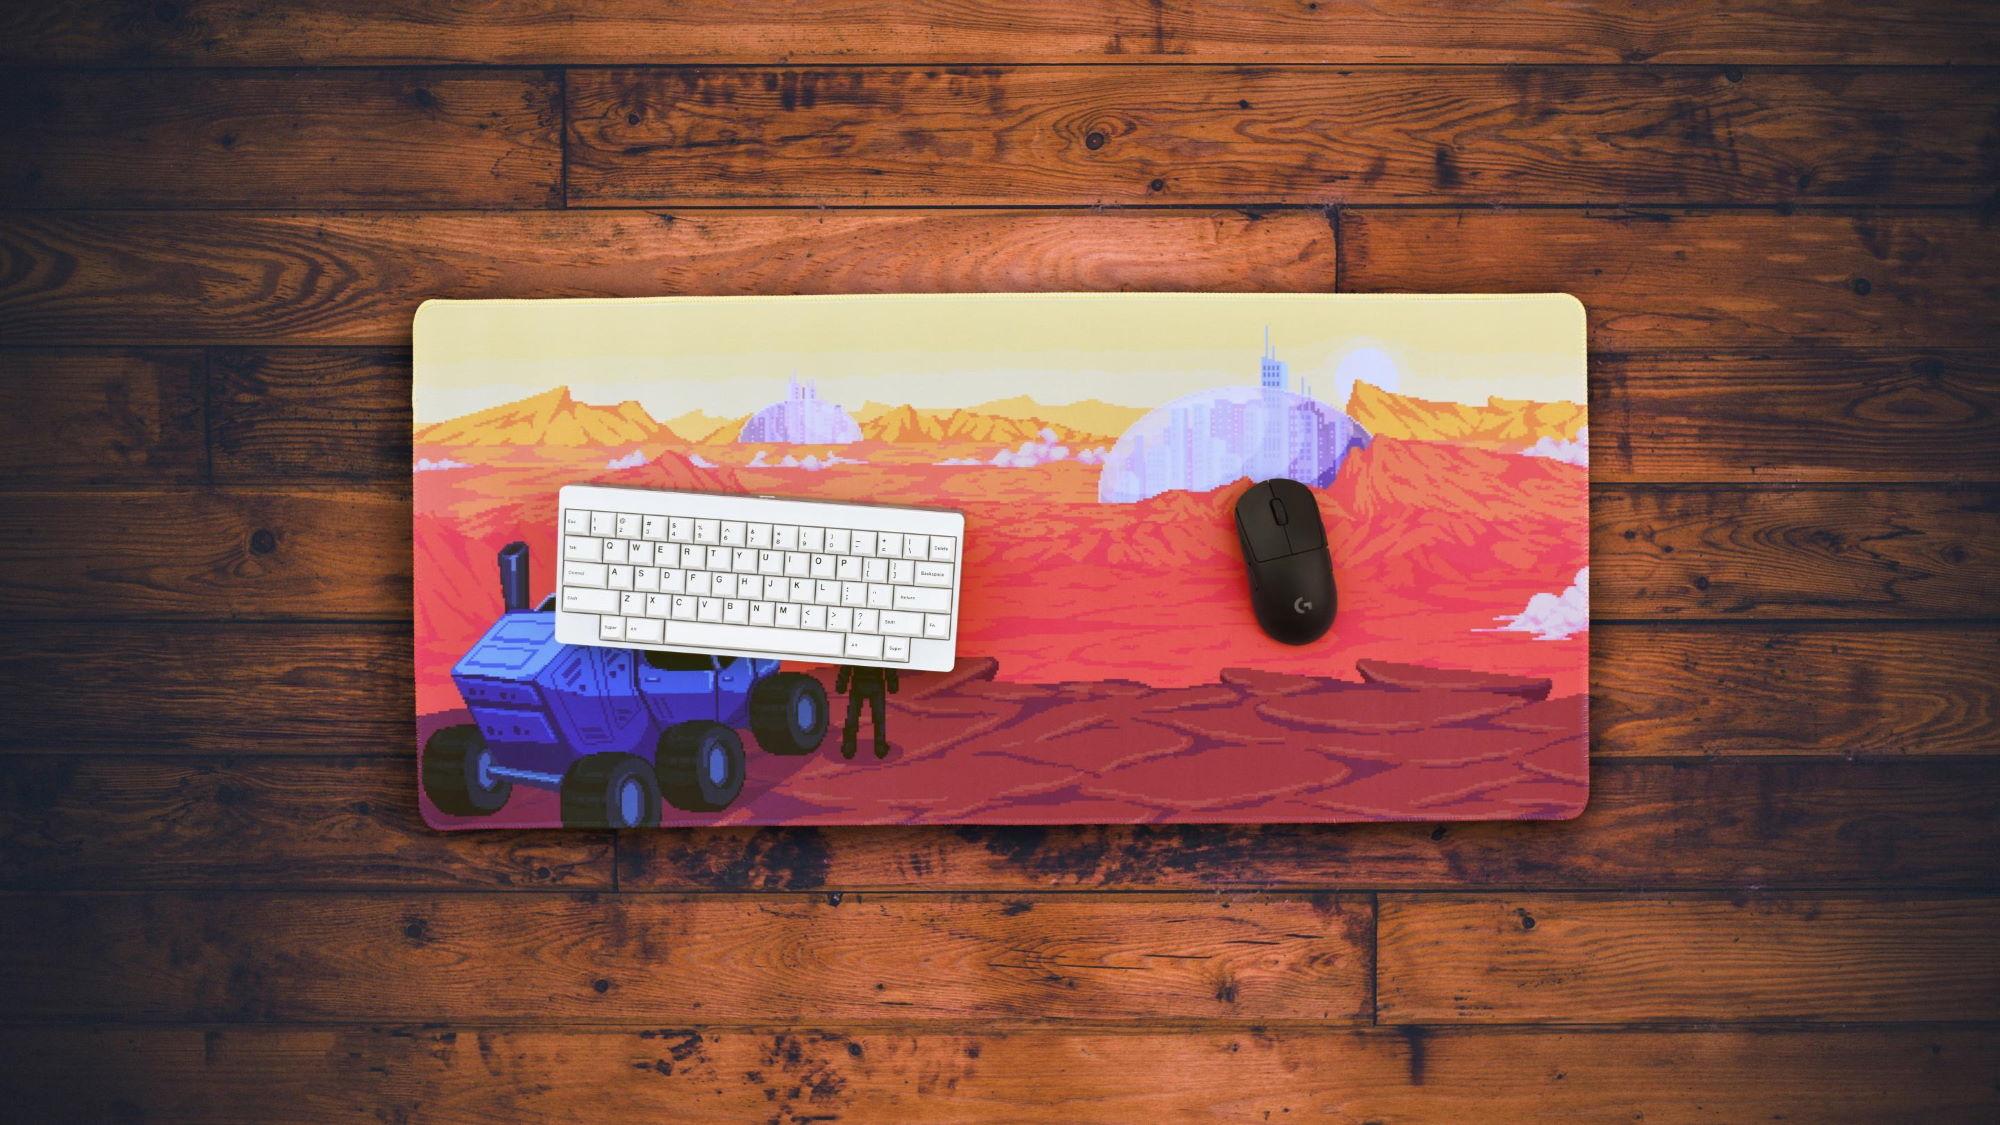 Odyssey Mars Deskpad